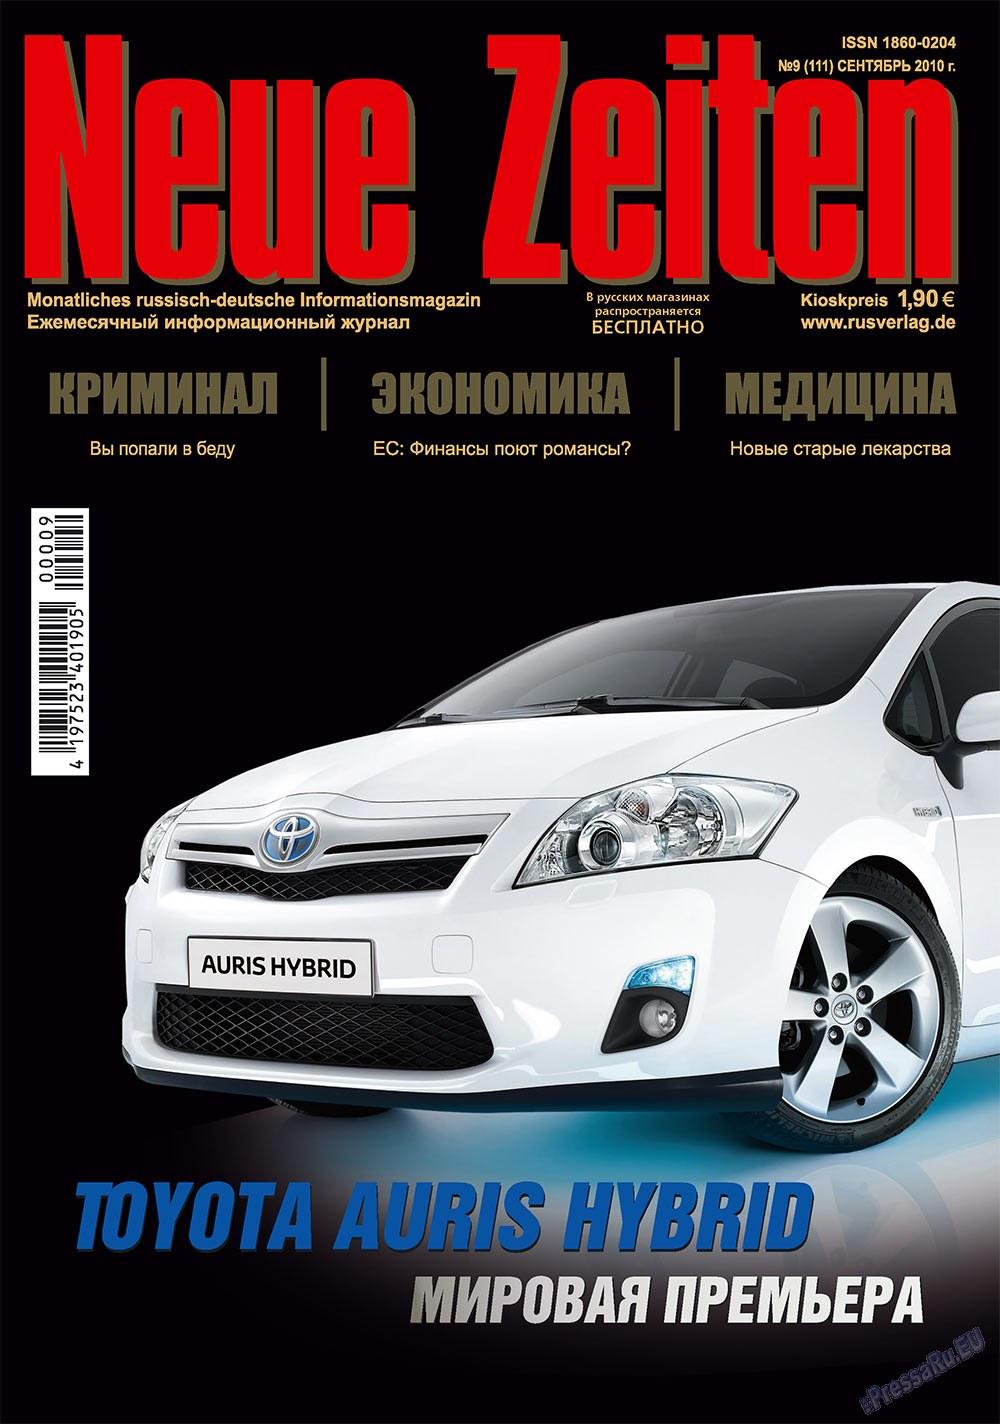 Neue Zeiten (журнал). 2010 год, номер 9, стр. 1